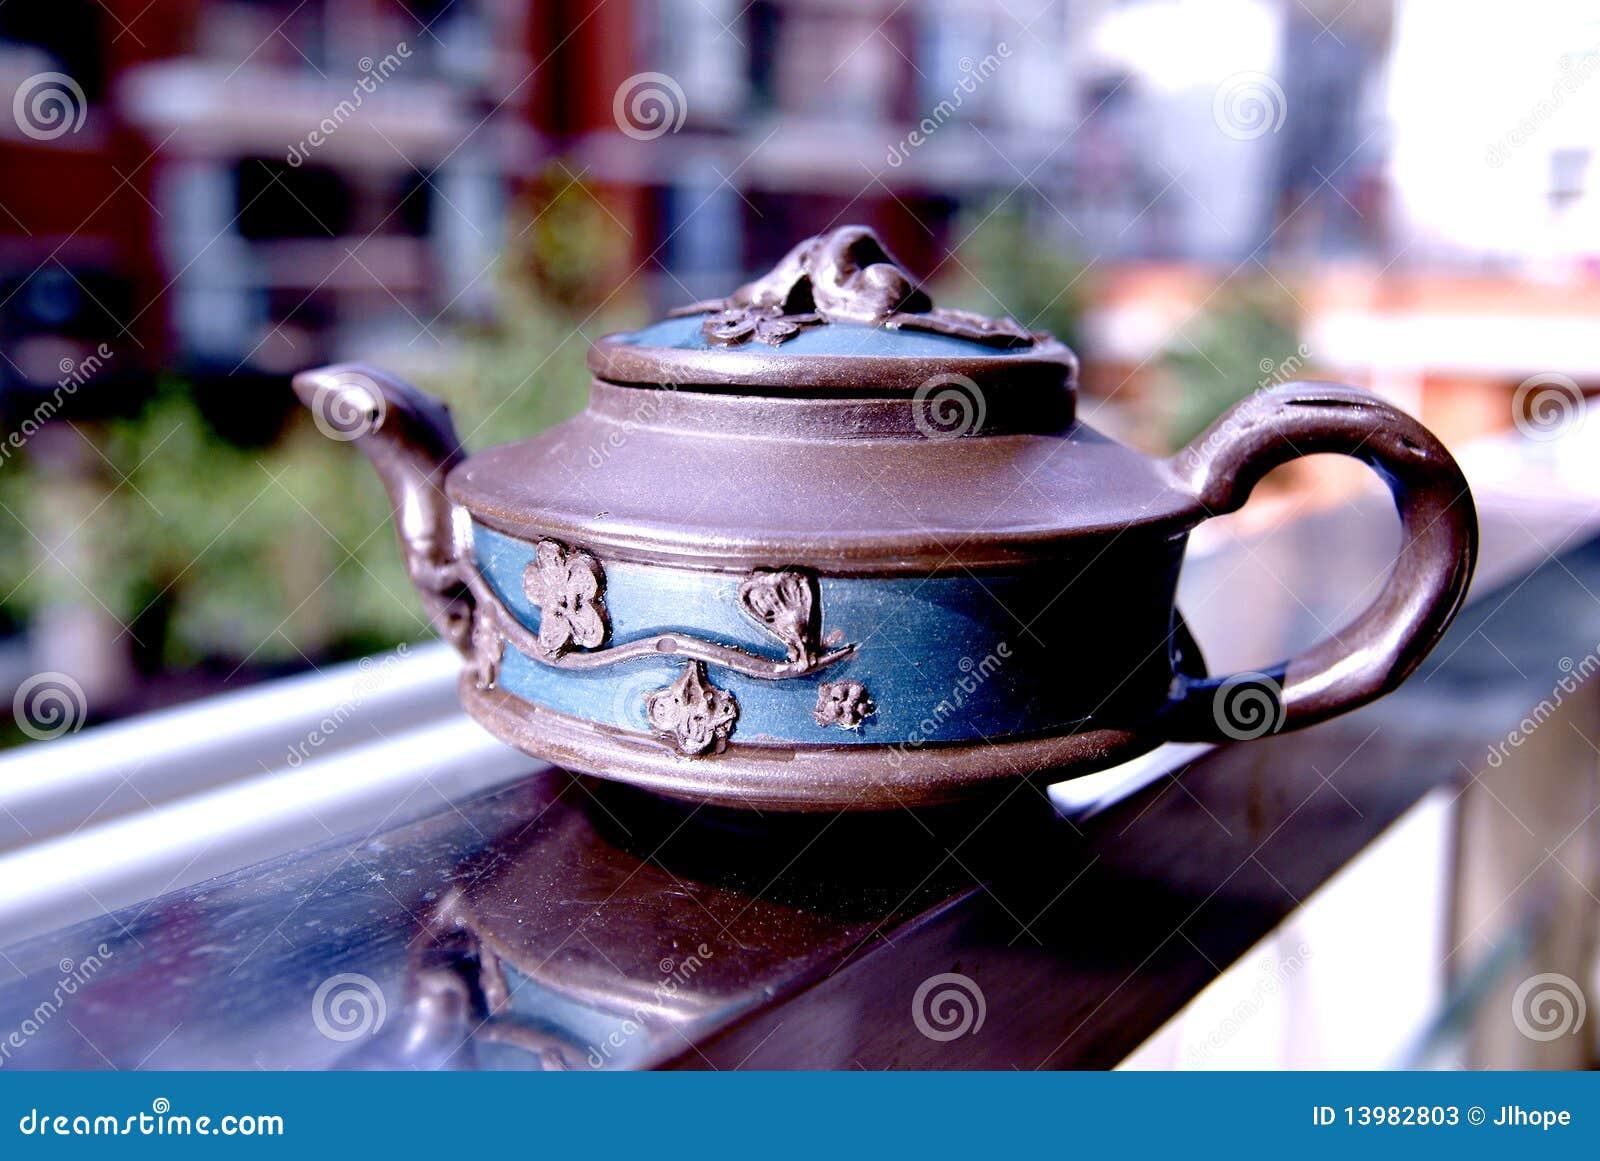 Bac chinois de thé